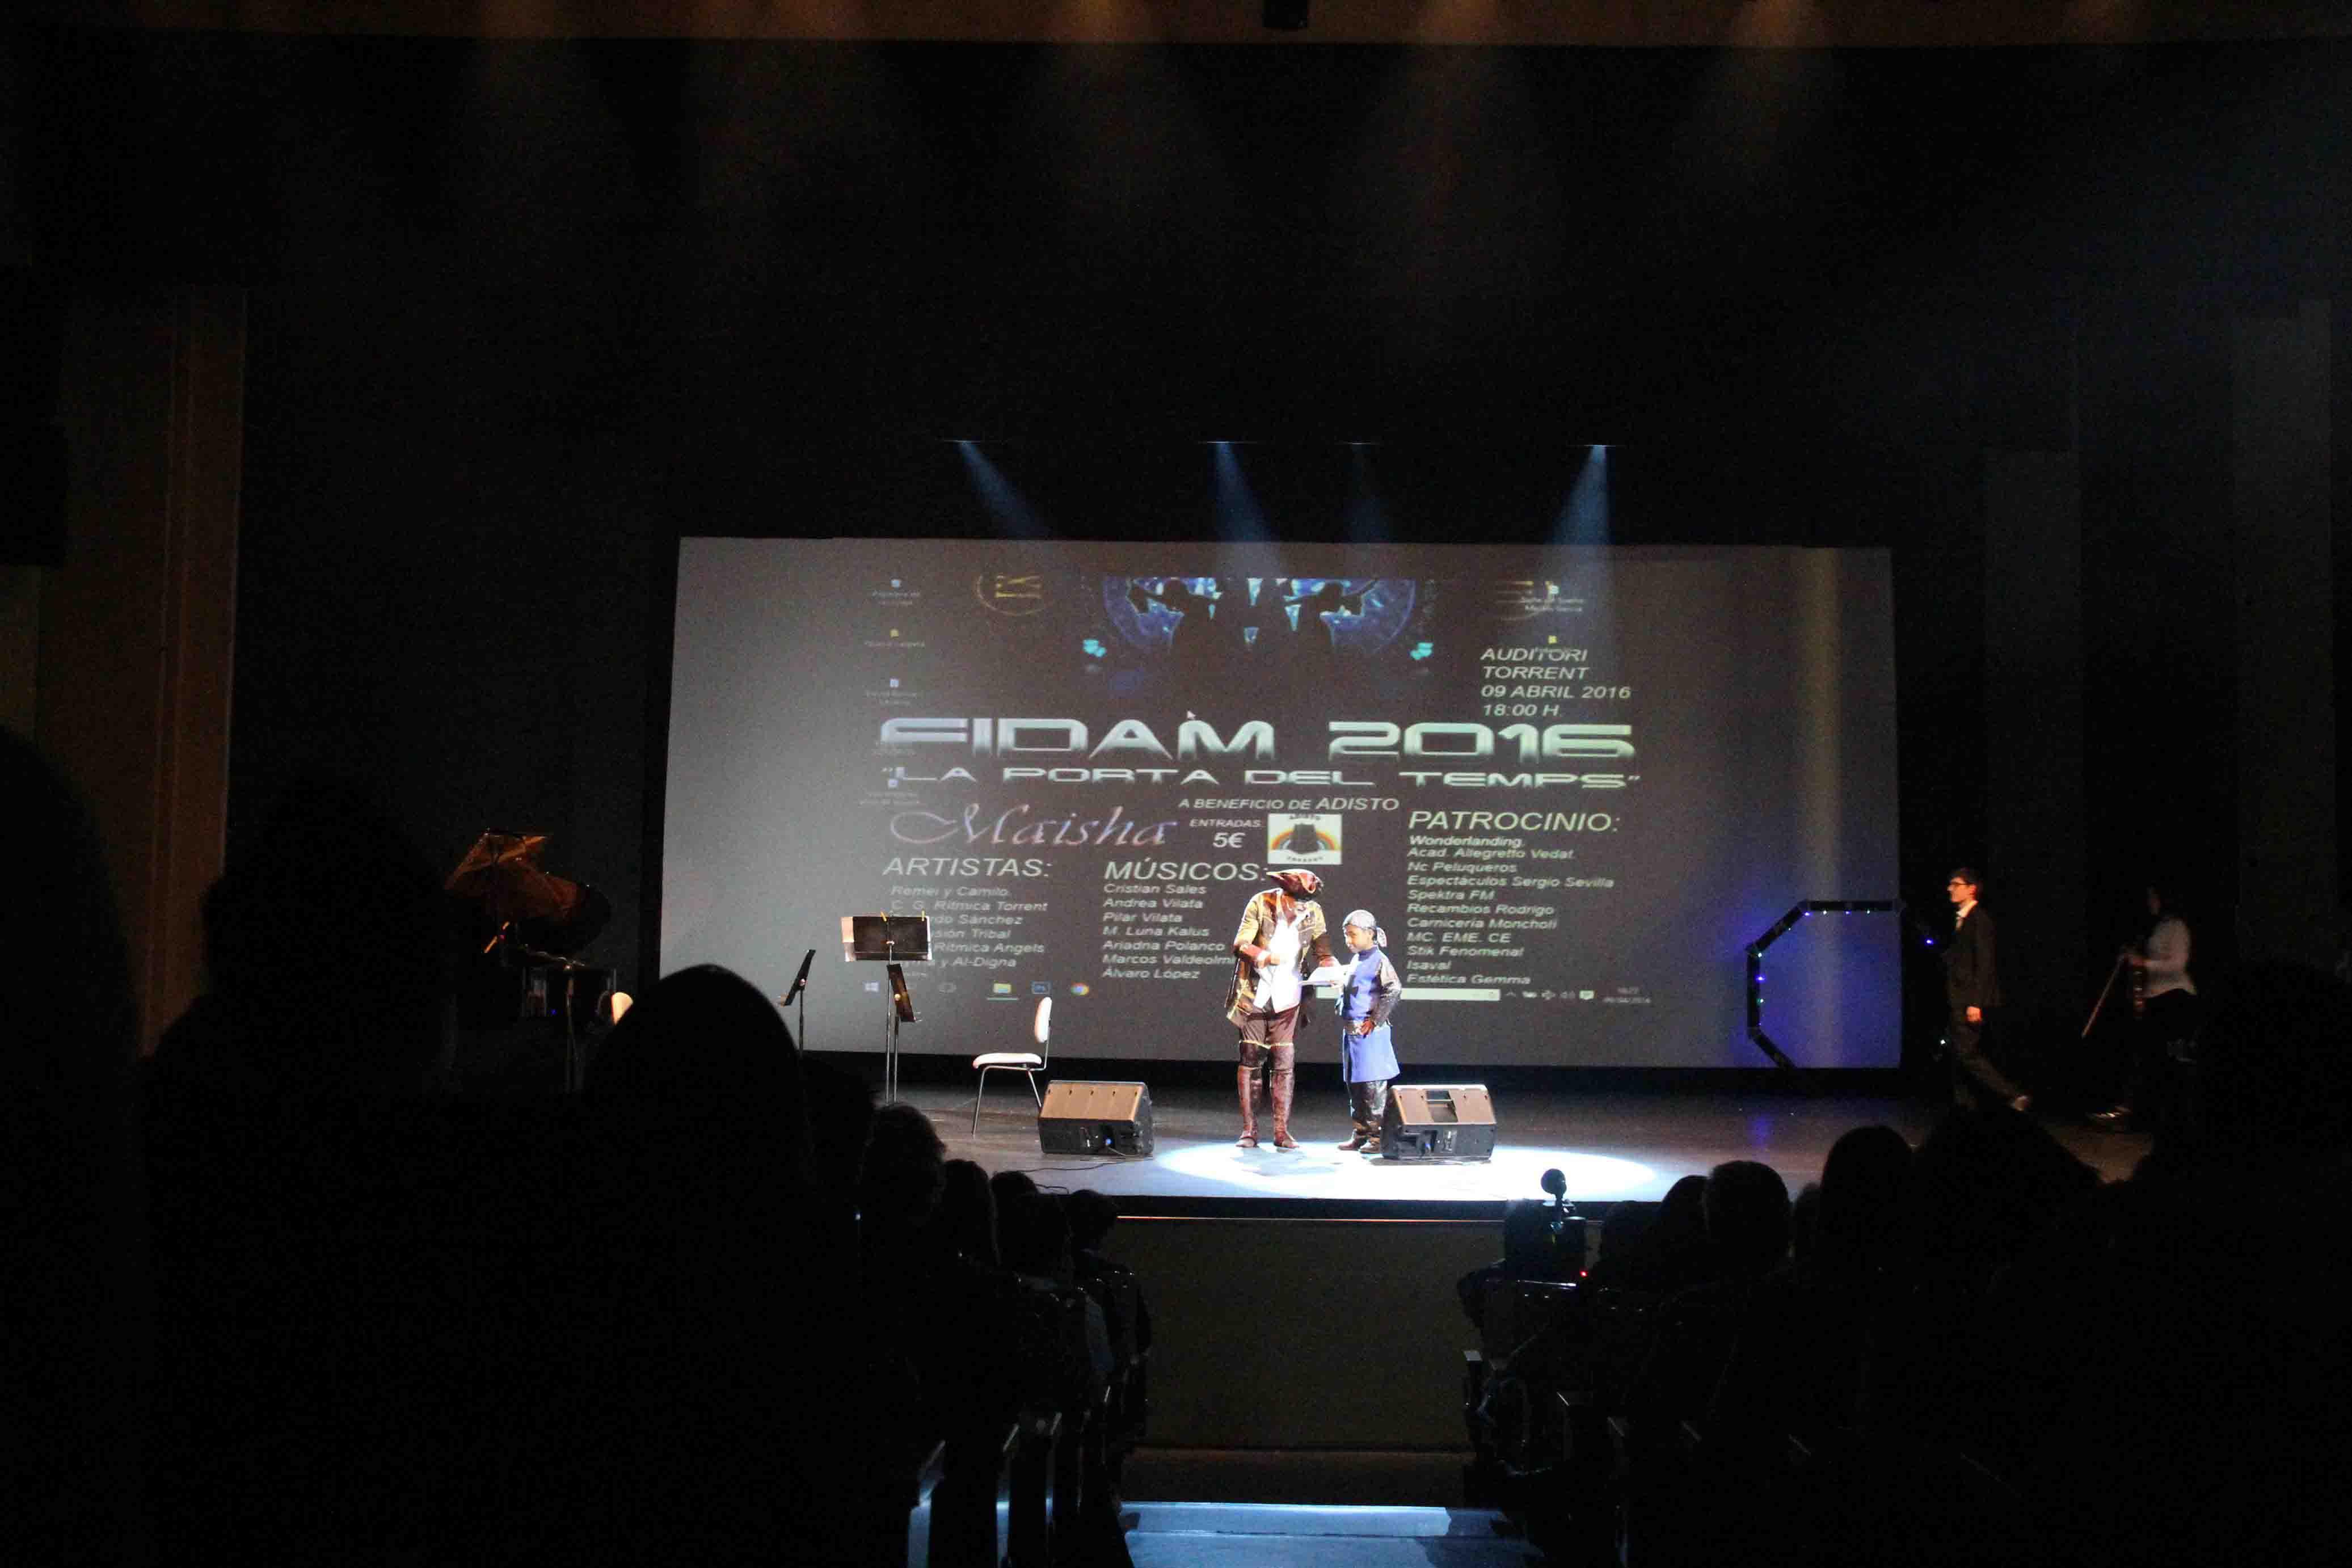 Torrent celebró la IV Gala Benéfica FIDAM en la que se recaudaron 2.215€